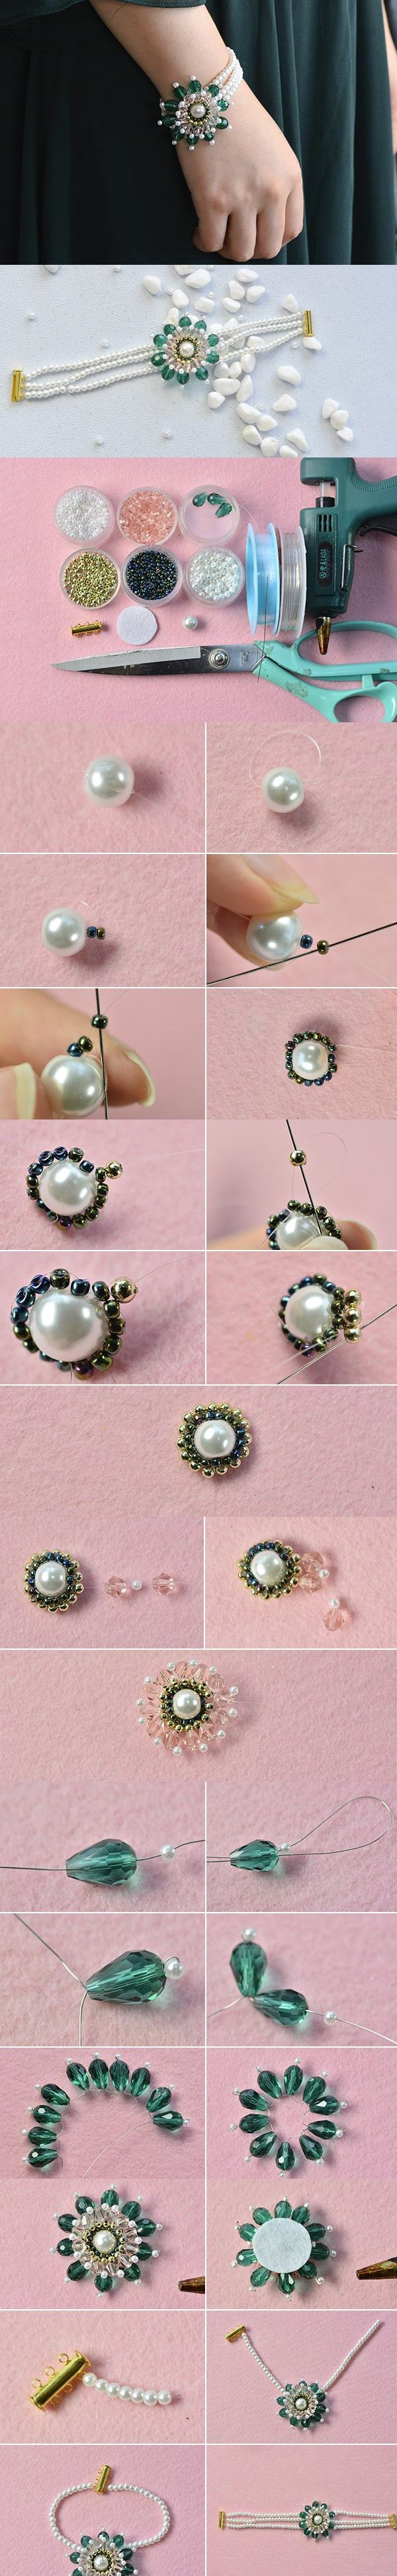 Handmade Three-strand Green Flower Bracelet with Pearl Beads #tutorial #bracelet #pandahall